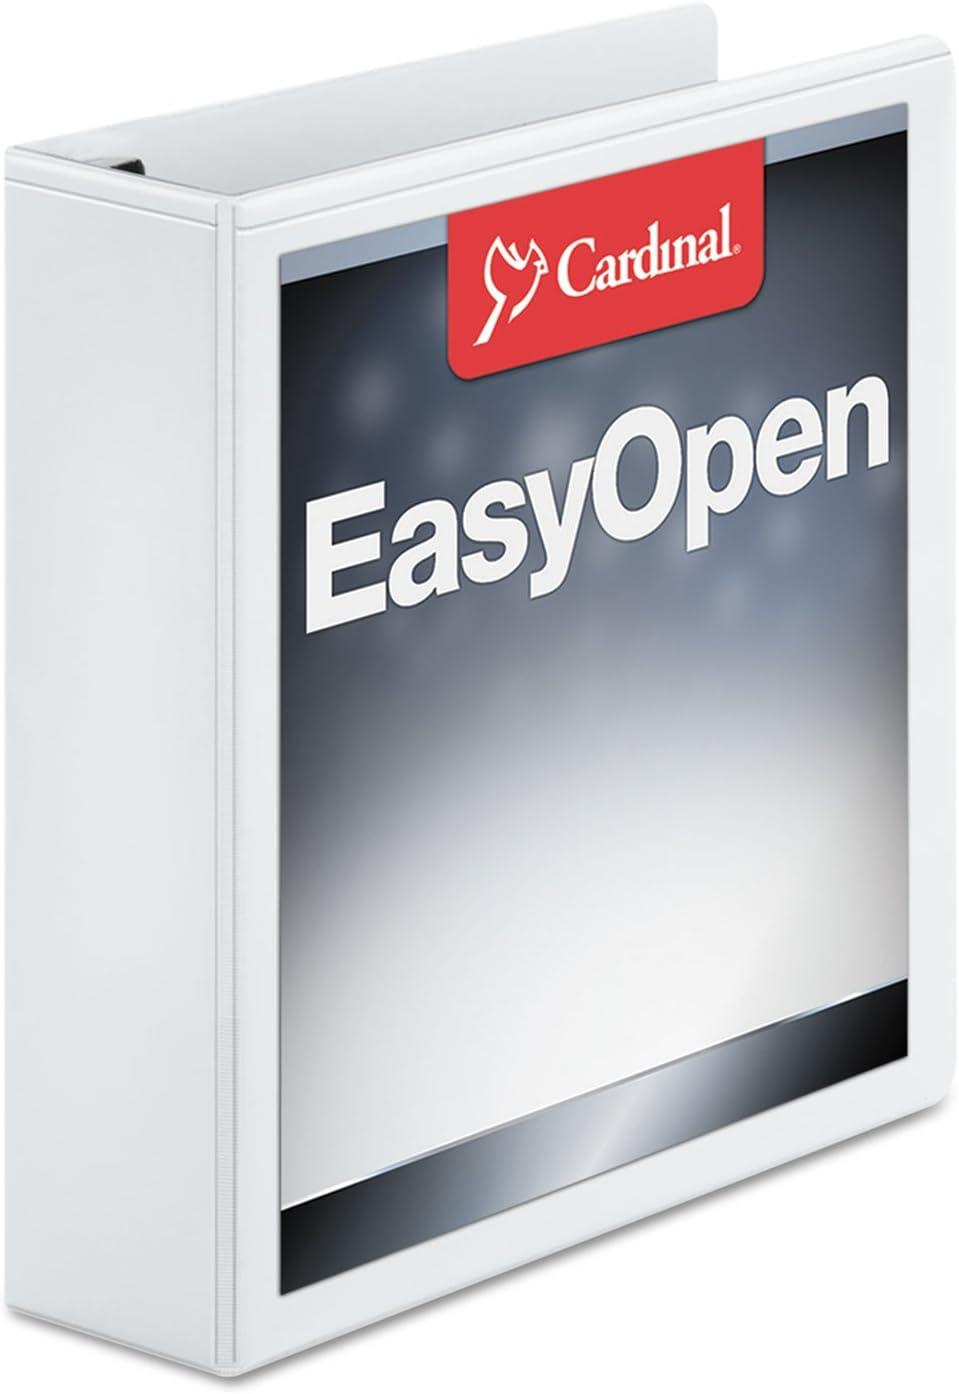 White CRD10320 EA 12 Cardinal Recycled ClearVue EasyOpen Vinyl D-Ring Presentation 3-Ring Binders 2 Capacity